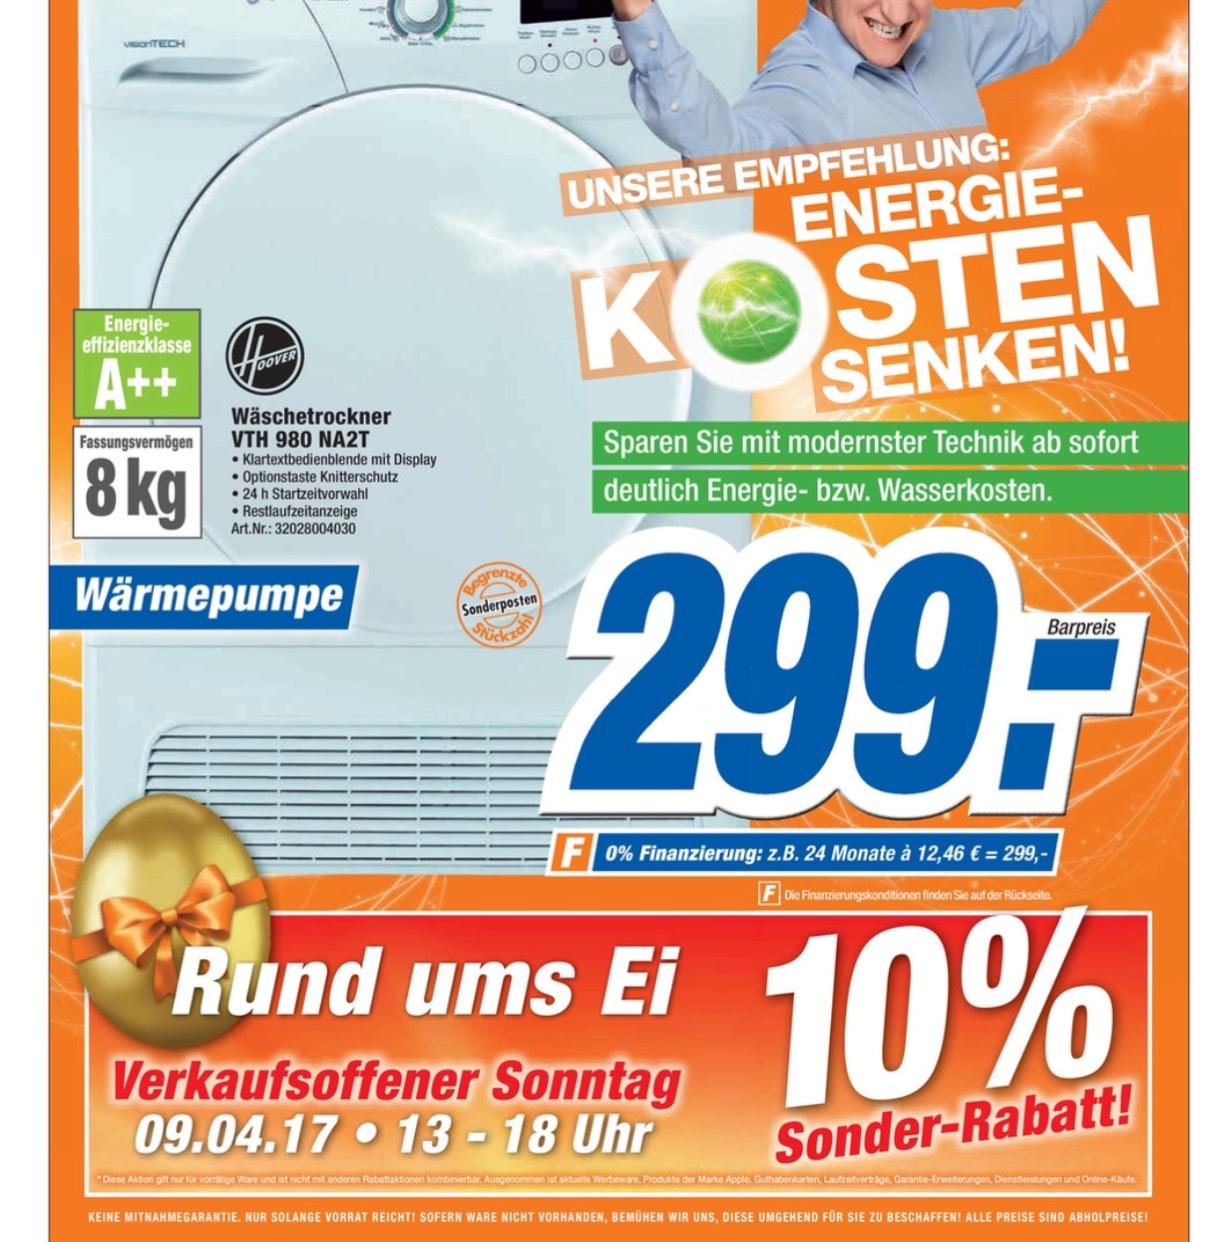 Lokal Expert Bielinsky Bad Neuenahr-Ahrweiler 10% Auf fast alles am verkaufsoffenen Sonntag